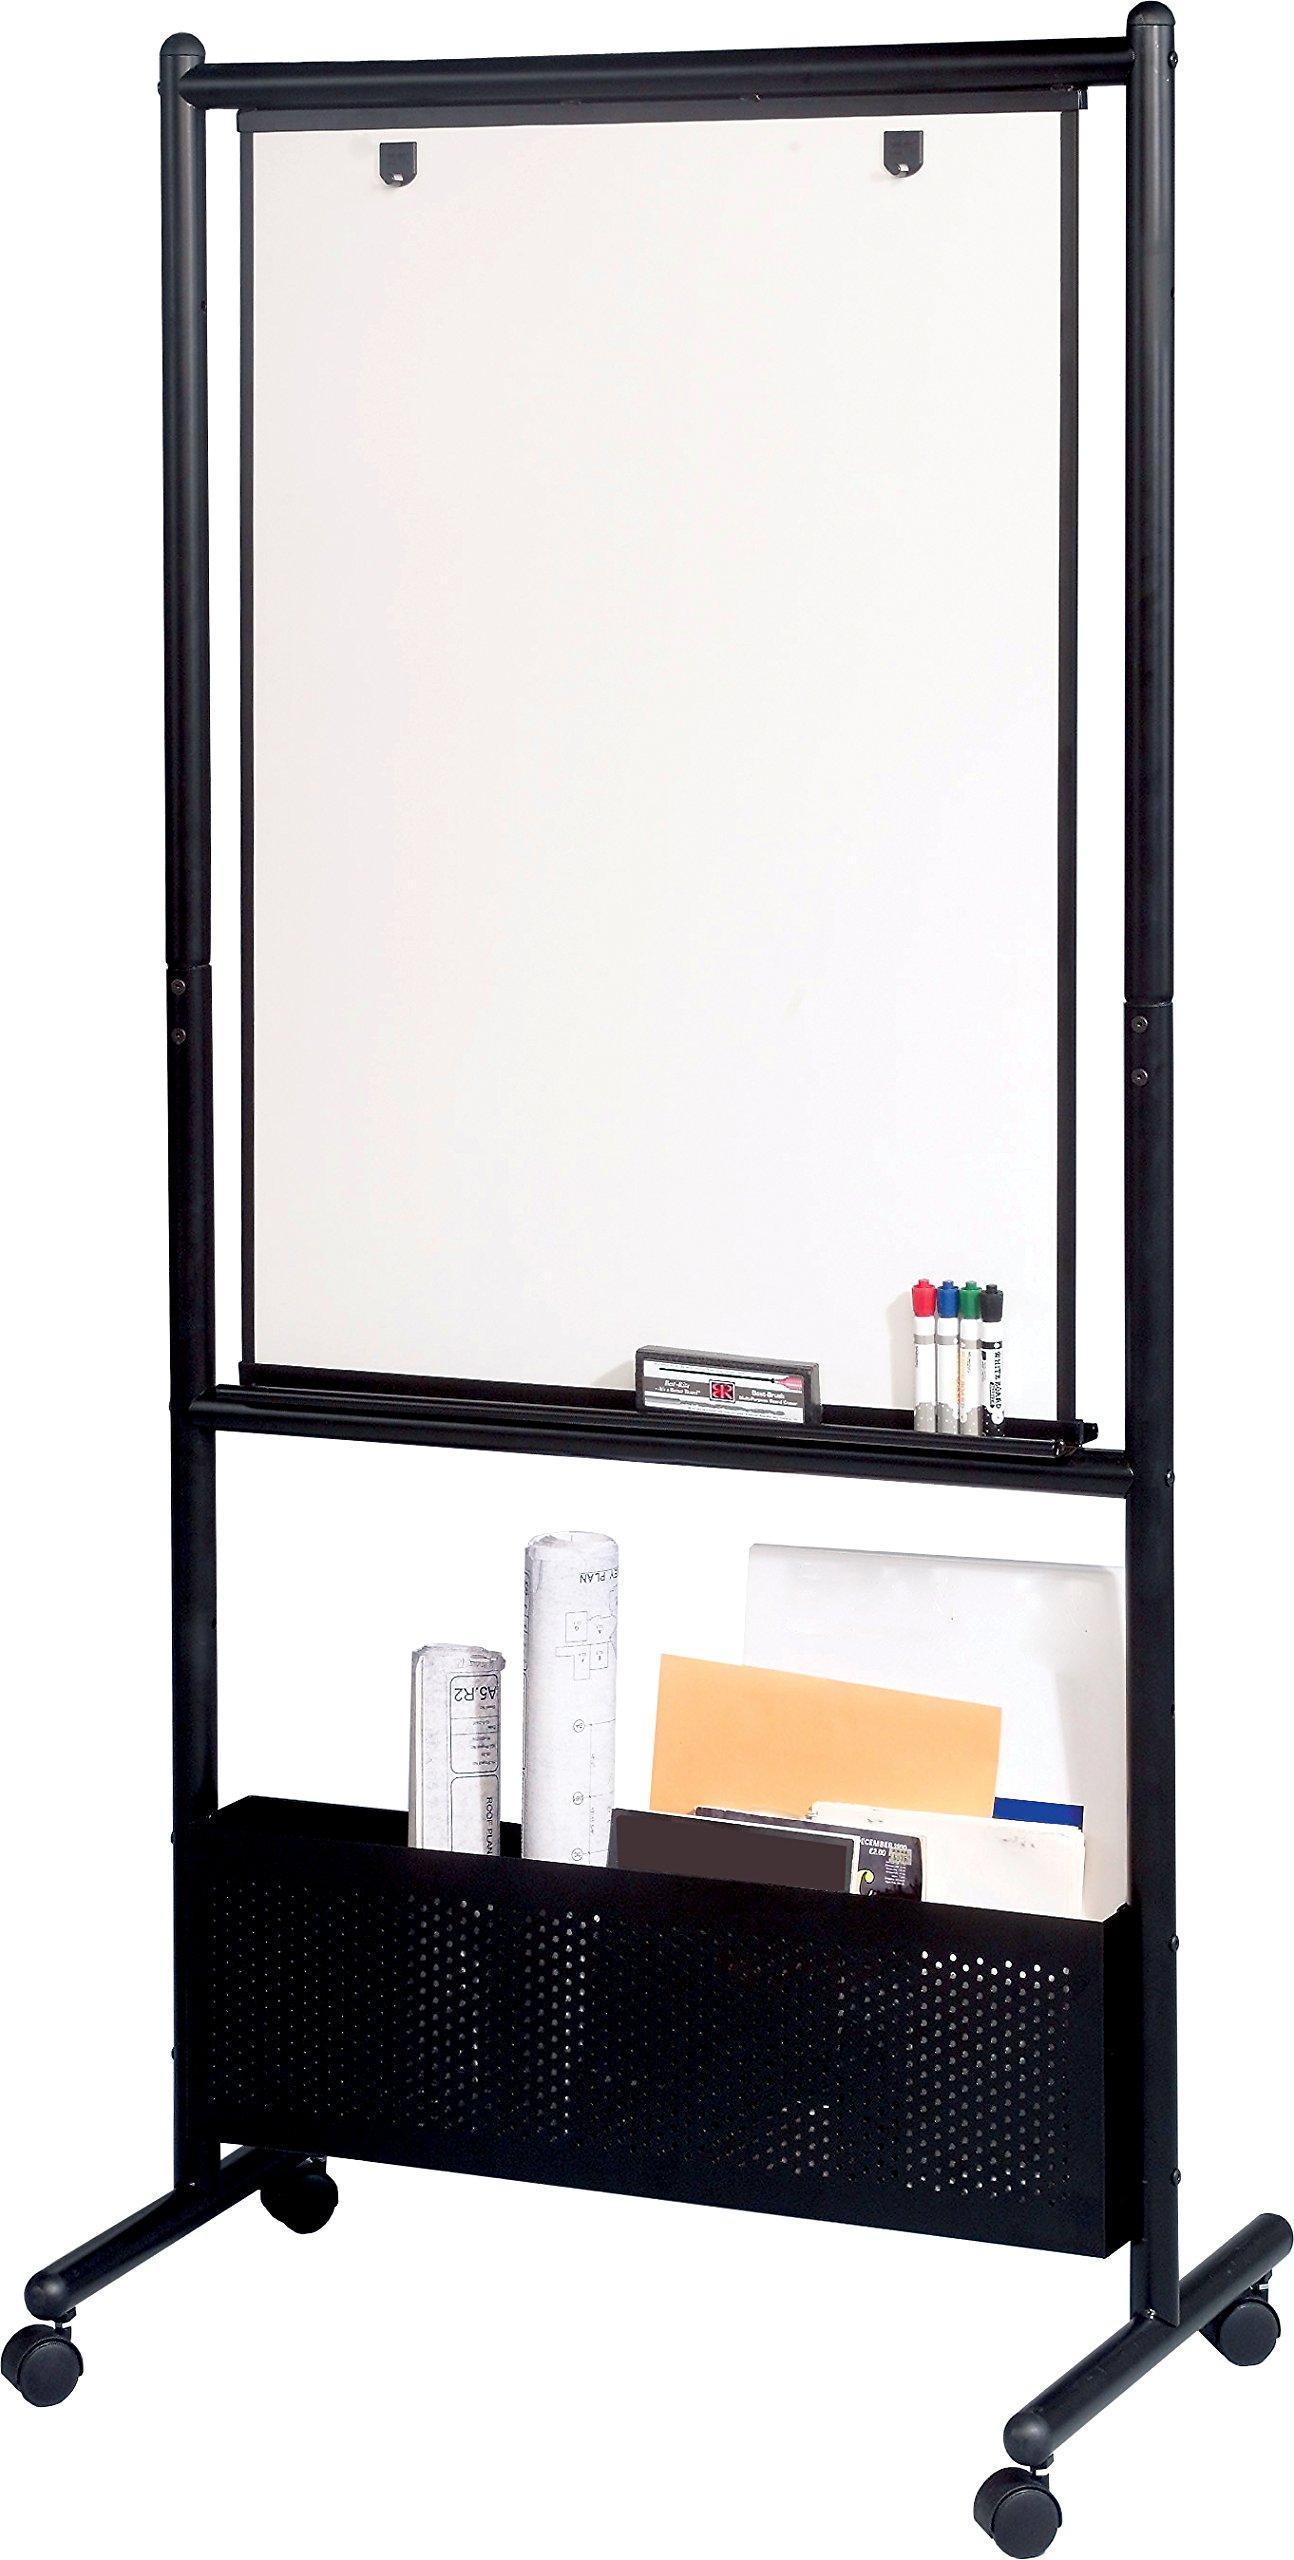 "Best-Rite Mobile Nest Easel, Black Frame, Double Sided Porcelain Steel Whiteboard, 72""H x 34.75""W x 24""D (781P)"